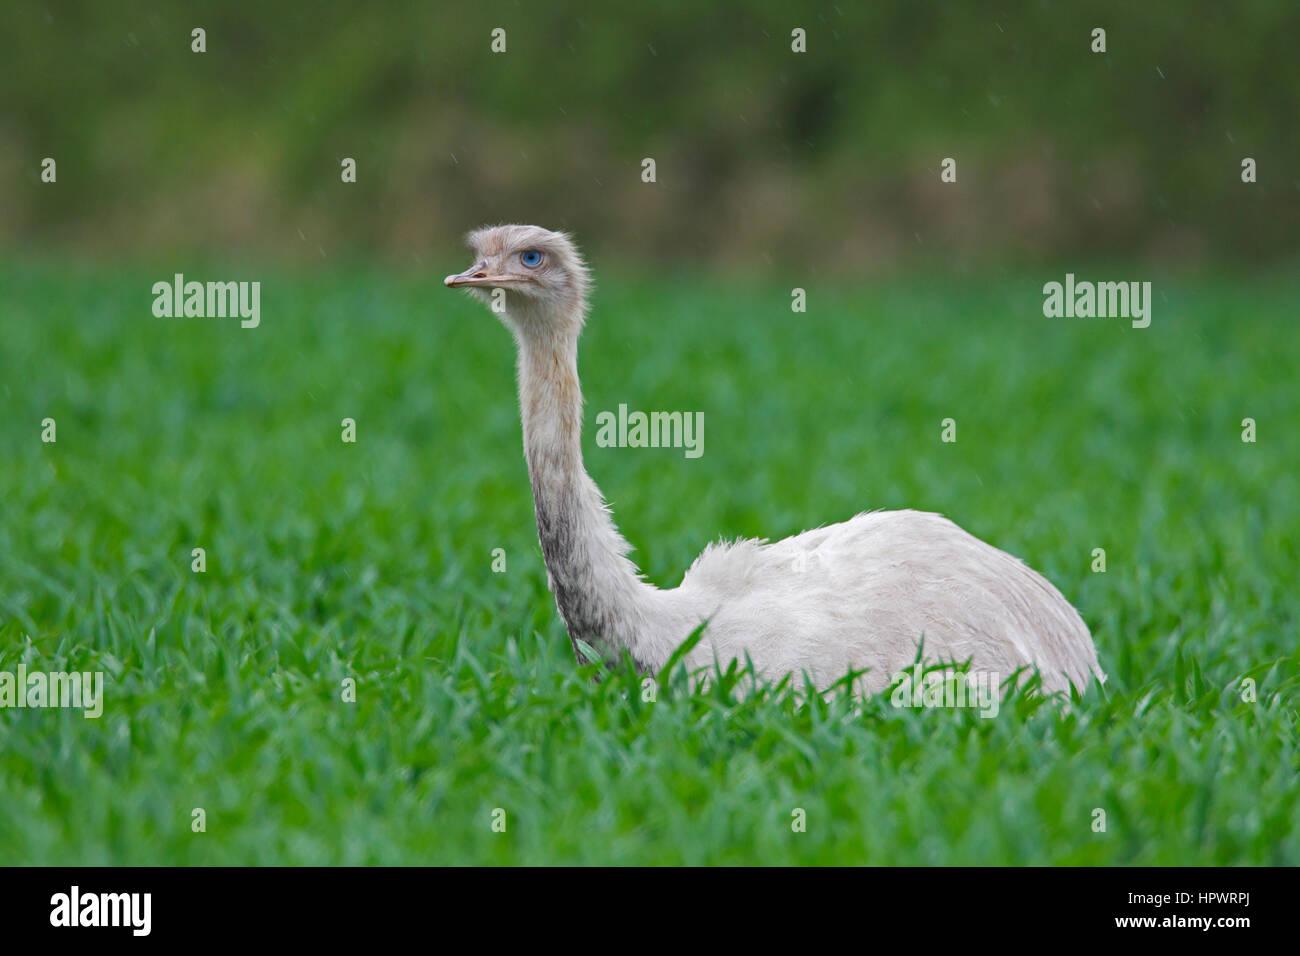 Leucistic greater rhea / American rhea / ñandú (Rhea americana), flightless bird / ratite, white morph - Stock Image